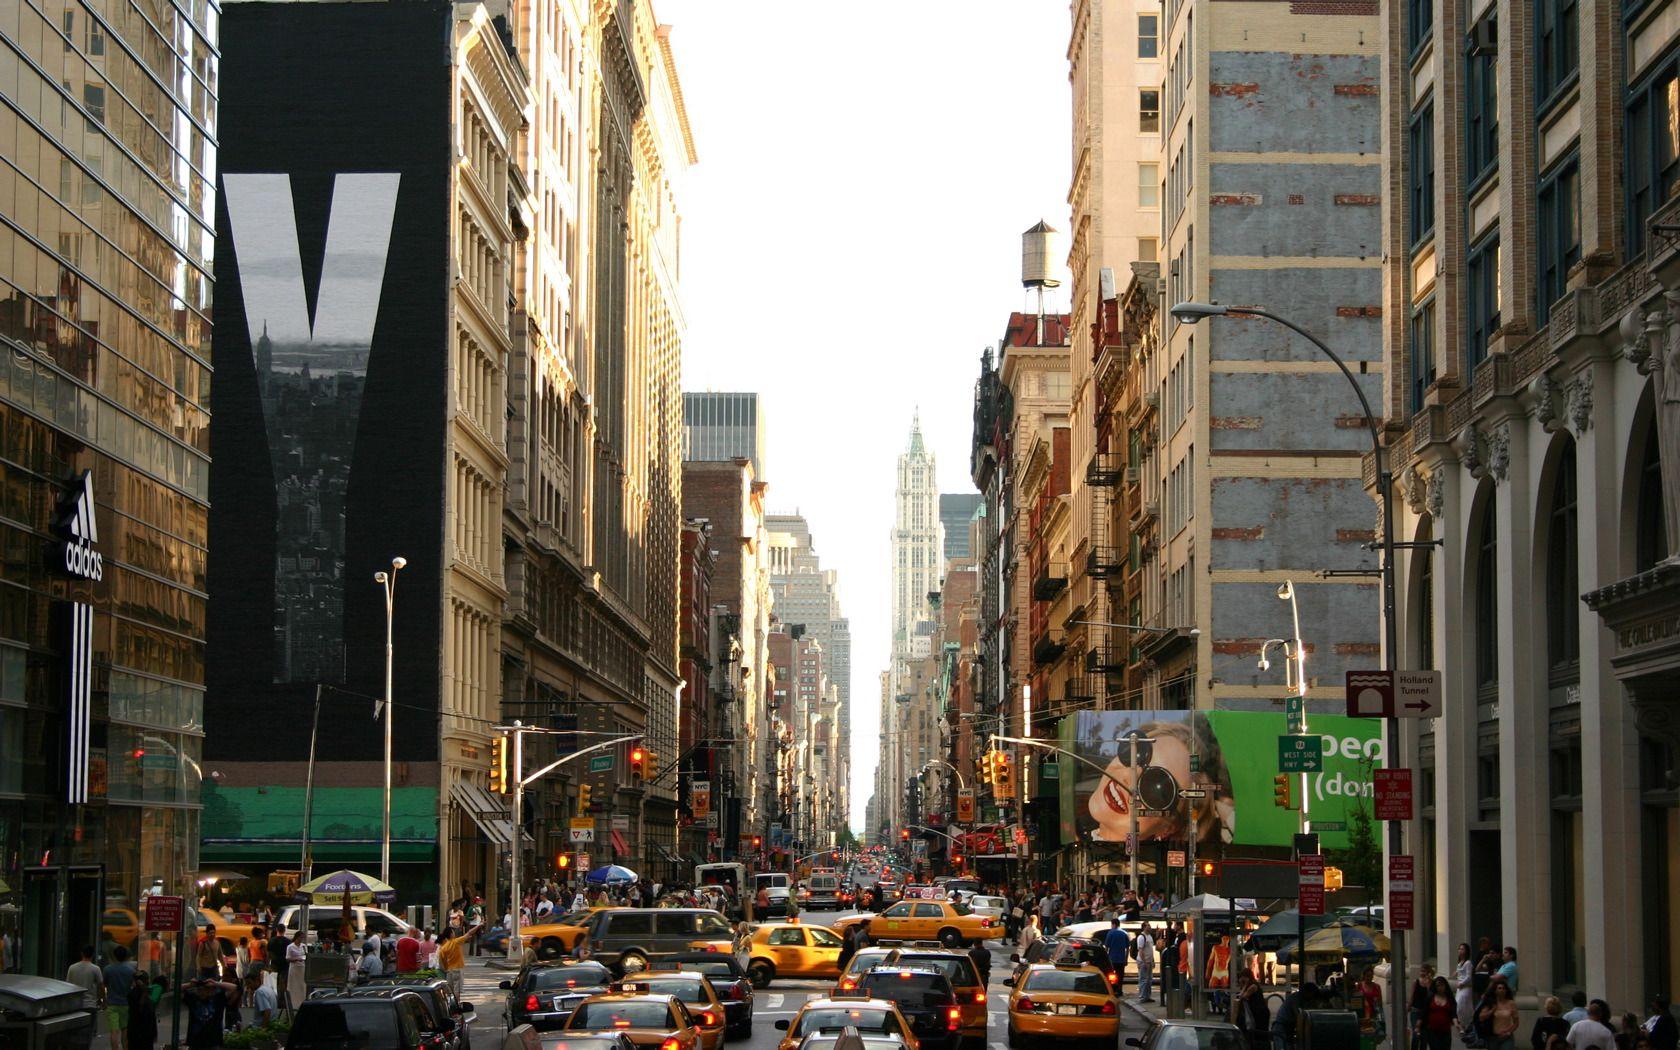 New York City New York Wallpaper City Wallpaper New York Street